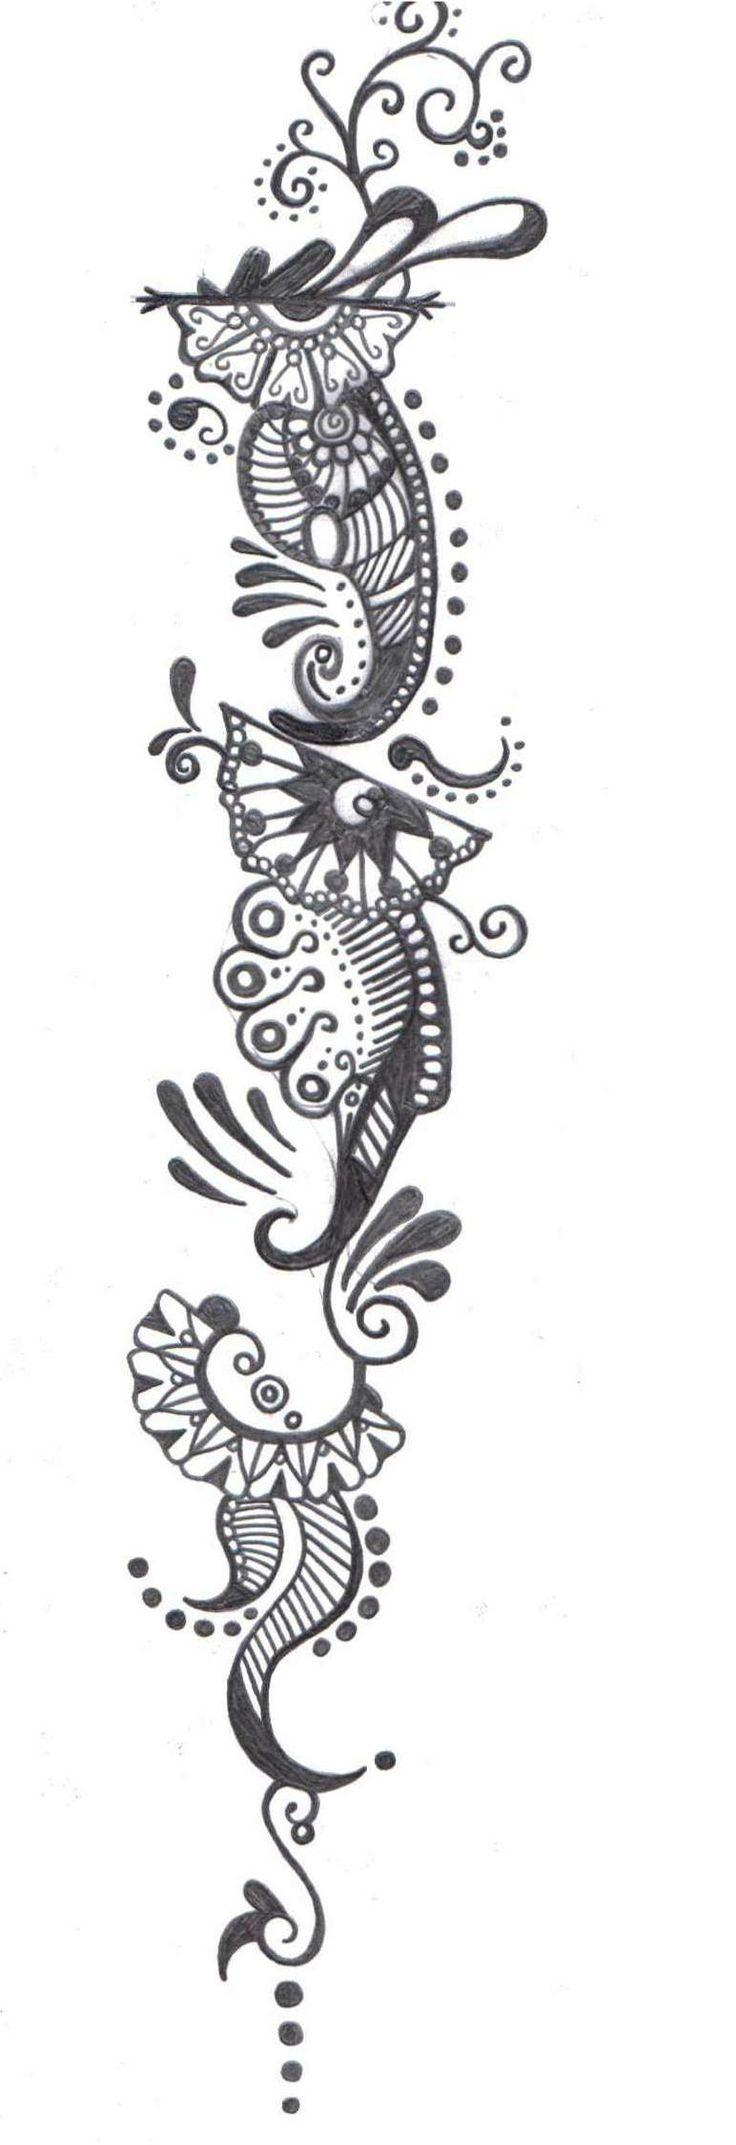 Henna tattoo charleston sc - Henna Sleeve Tattoo By Thegodessoflove On Deviantart